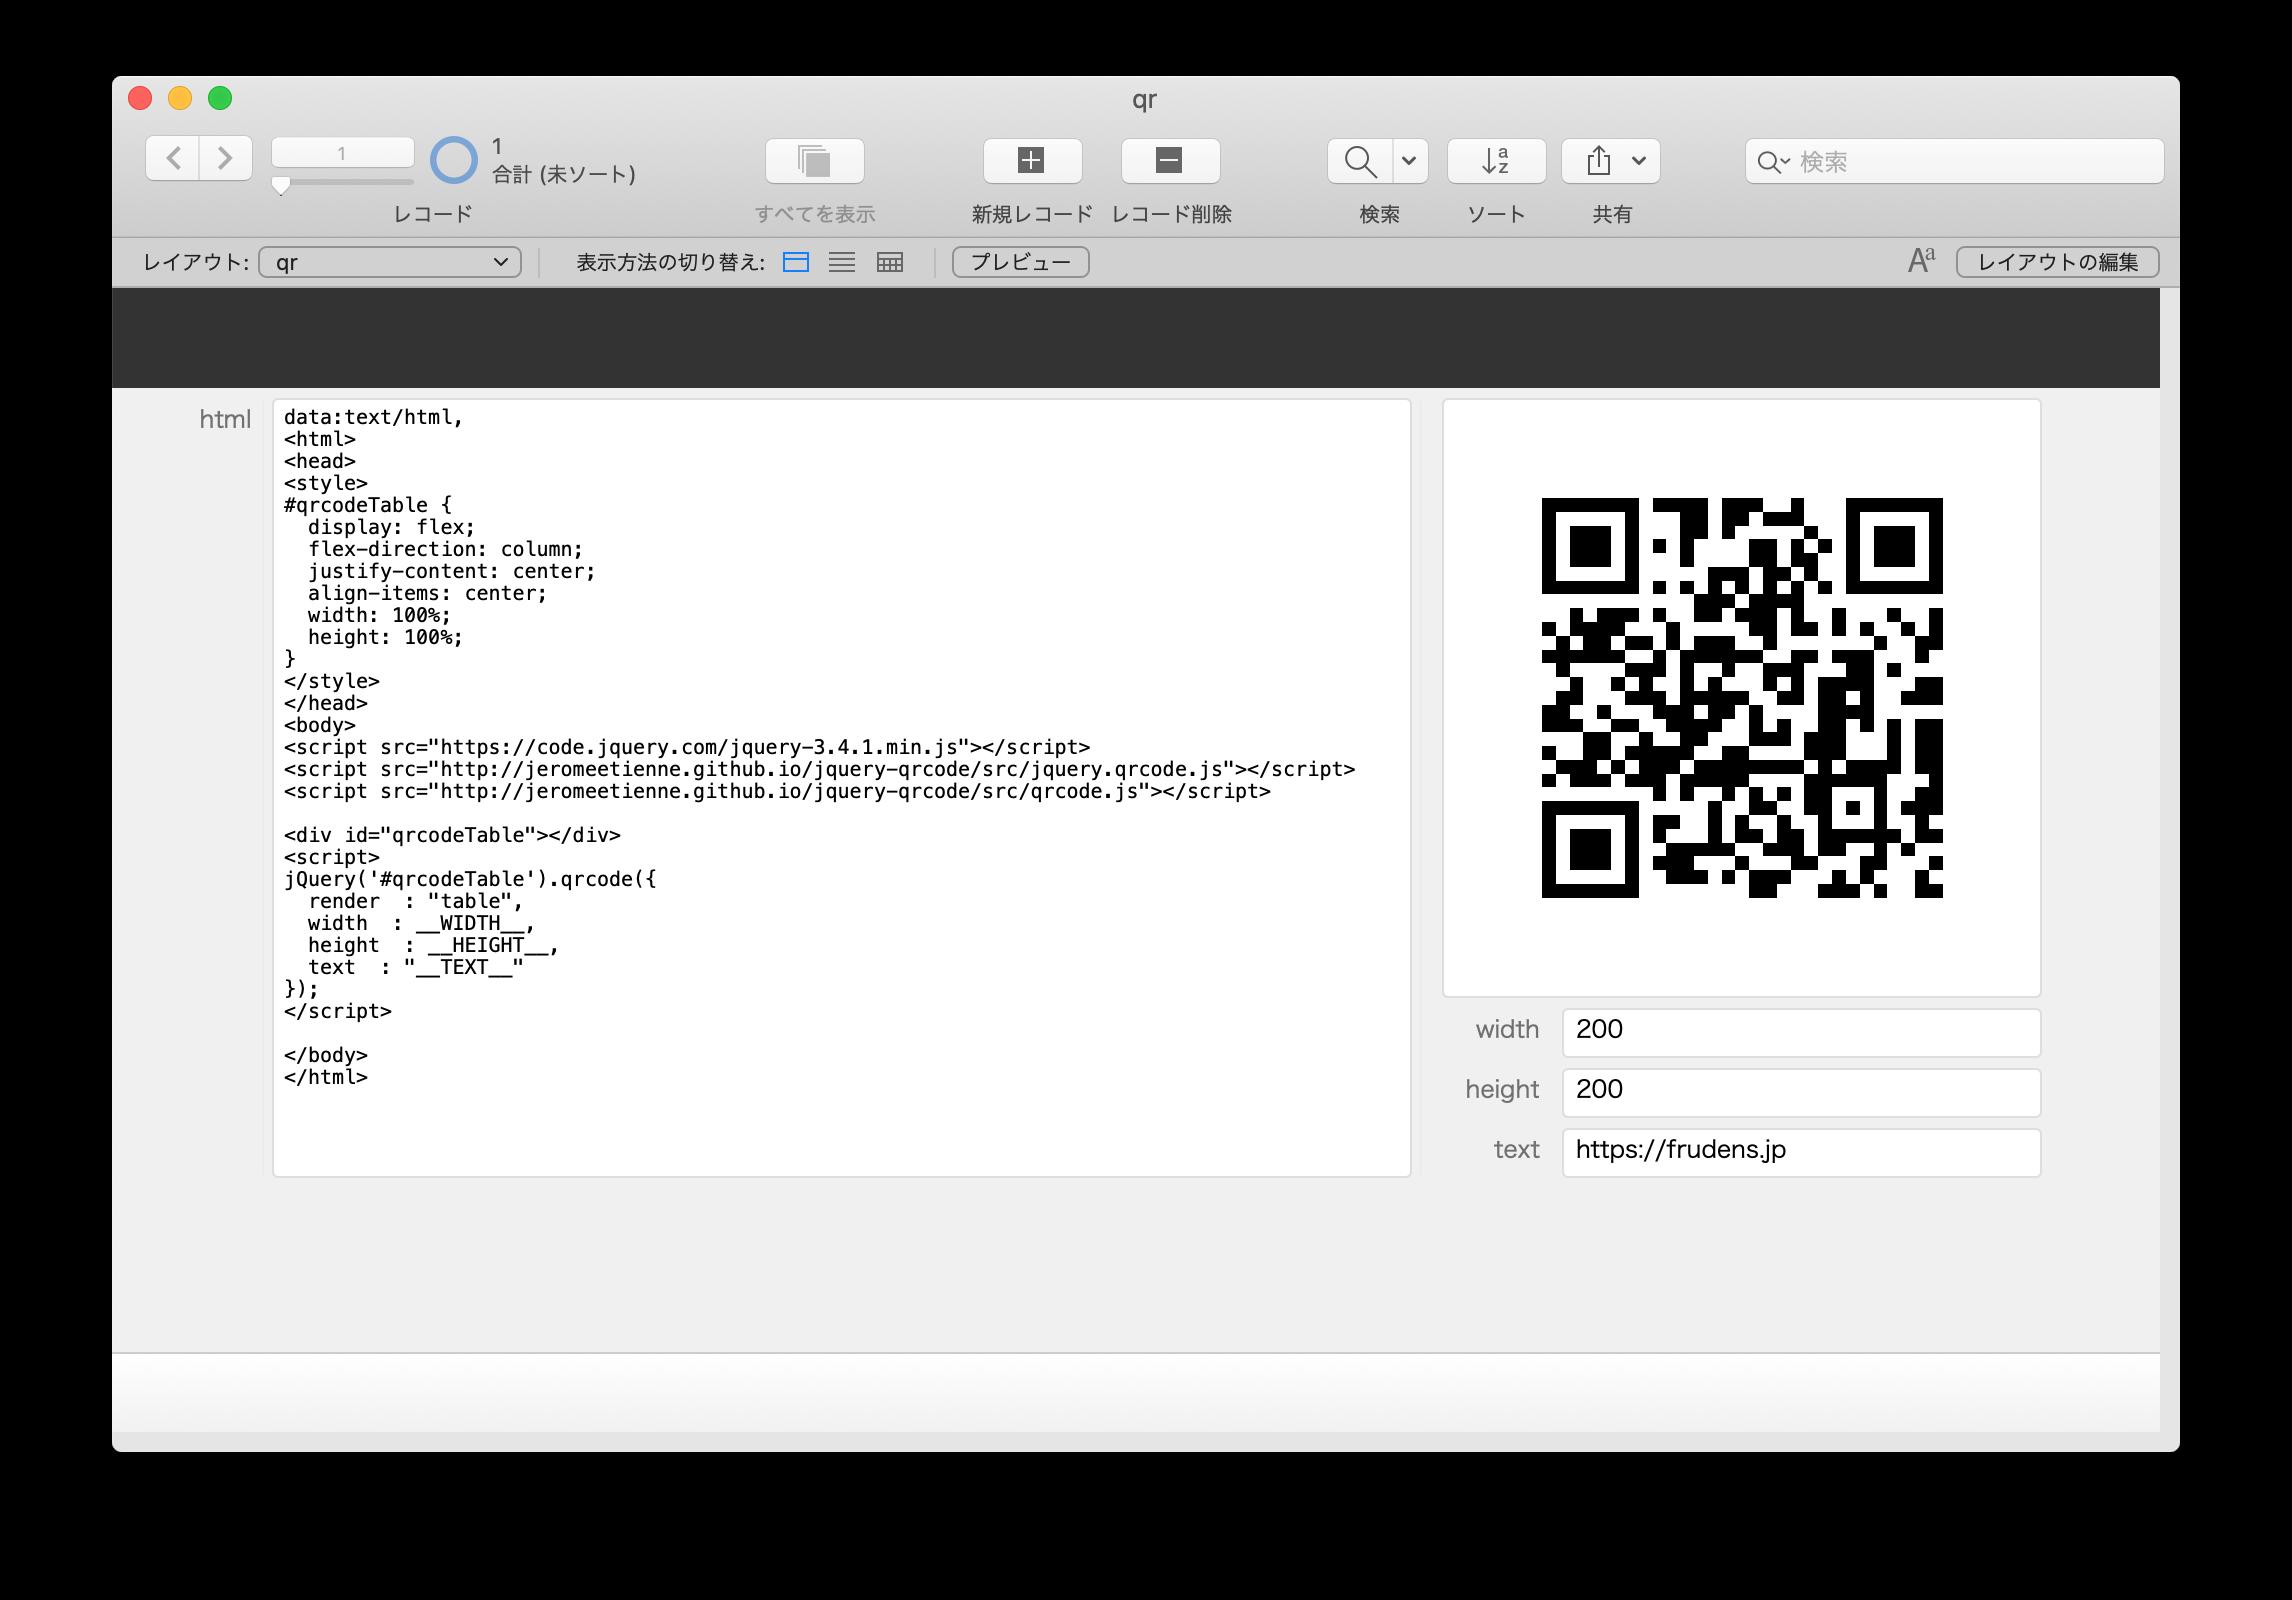 filemaker-simple-qr-code-view-1